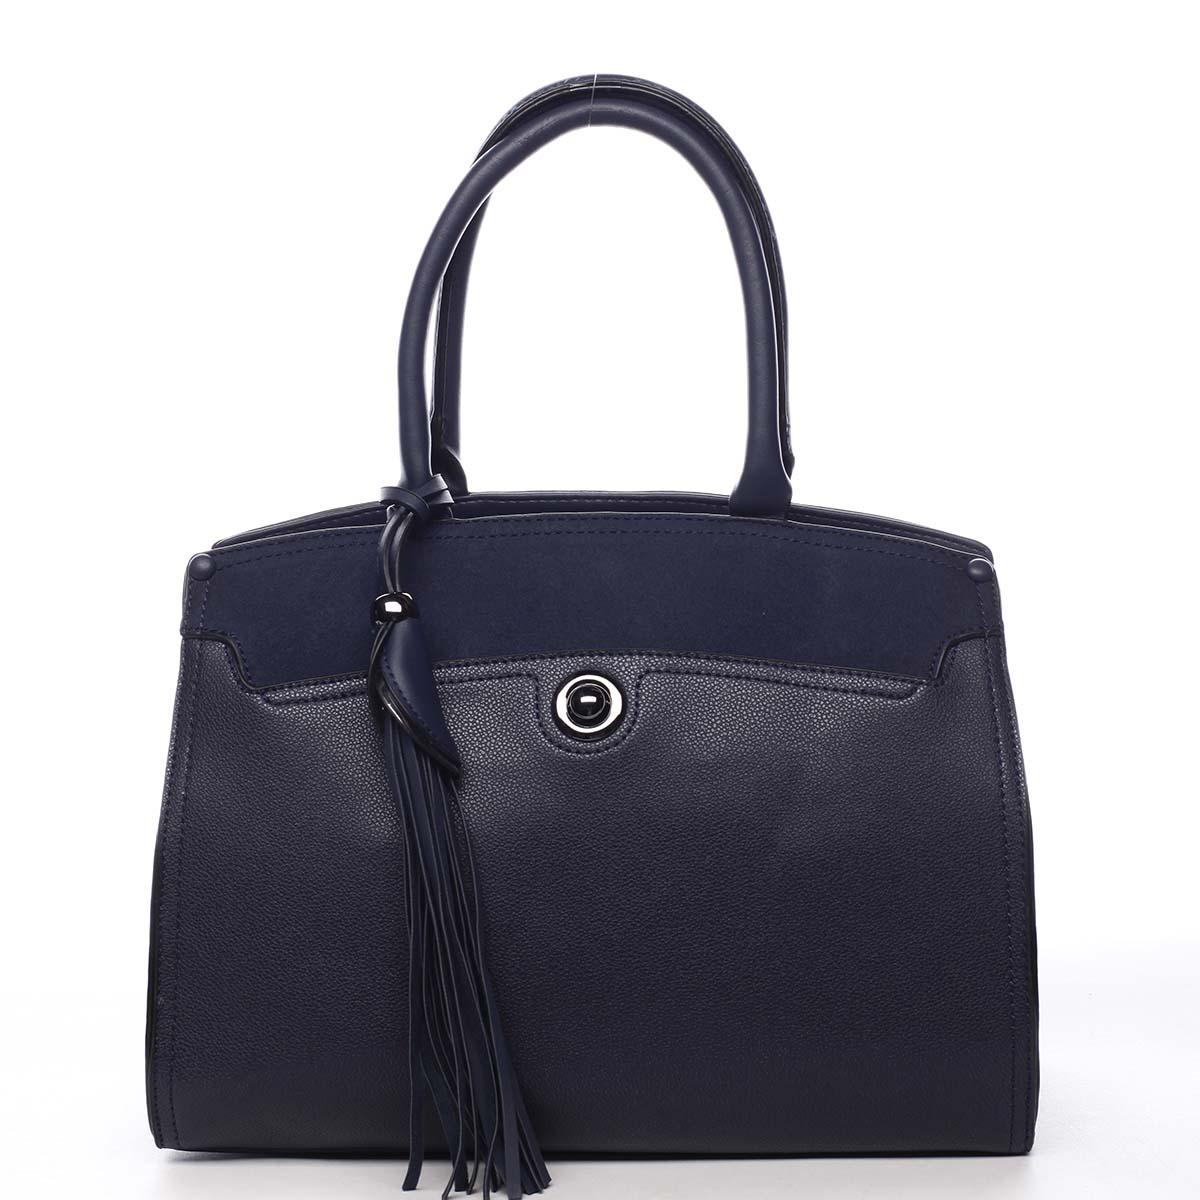 Dámska kabelka do ruky tmavomodrá - Maria C Toxic modrá